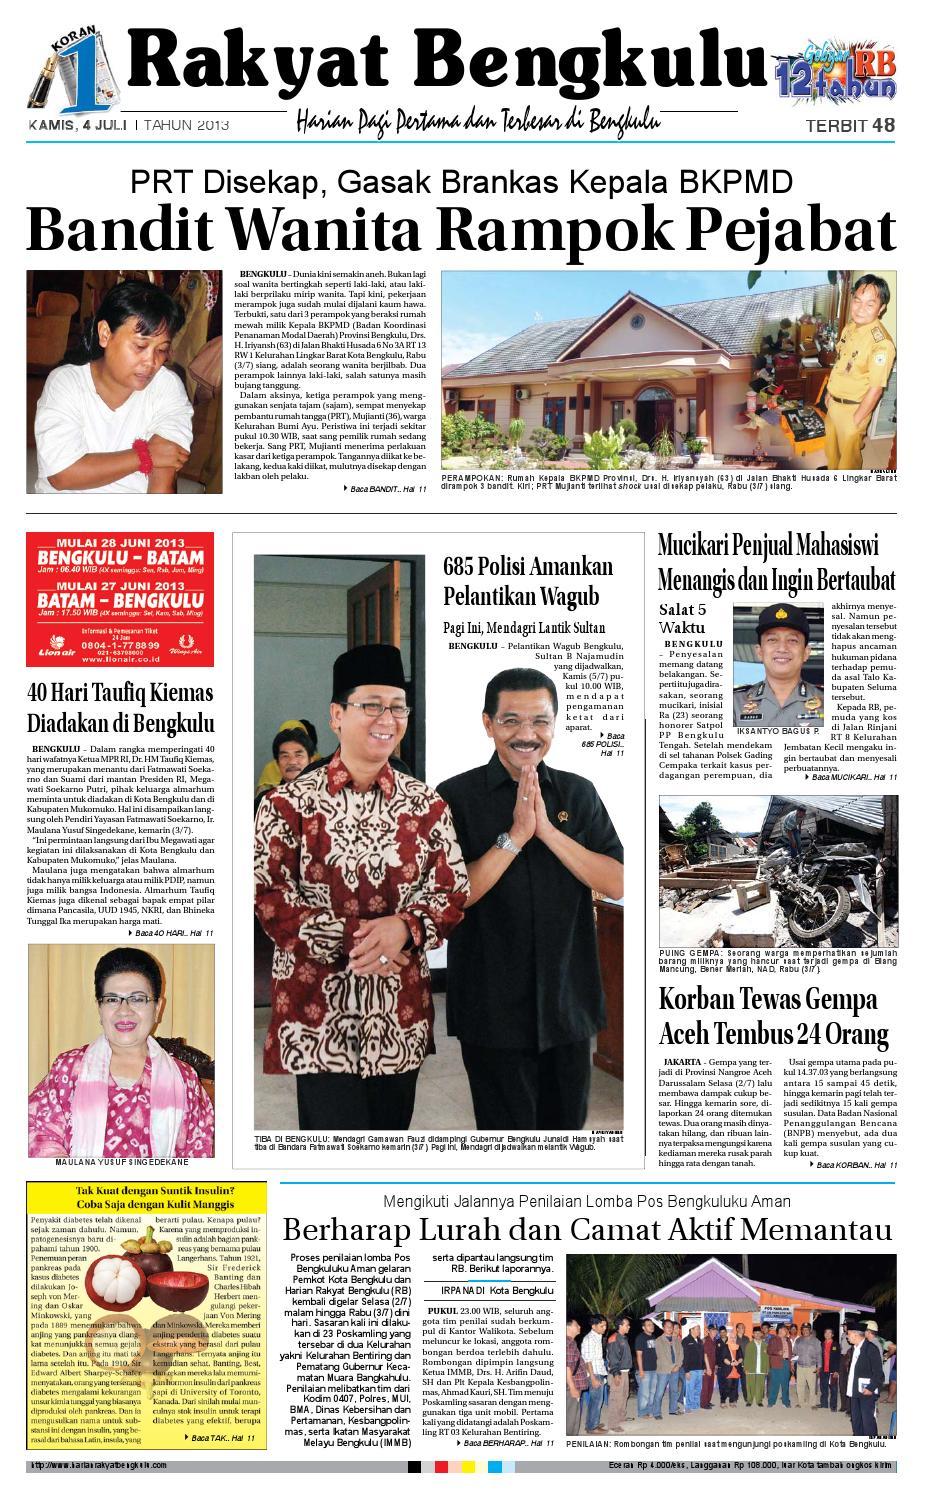 4 JULI 2013 by Rakyat Bengkulu rb - issuu